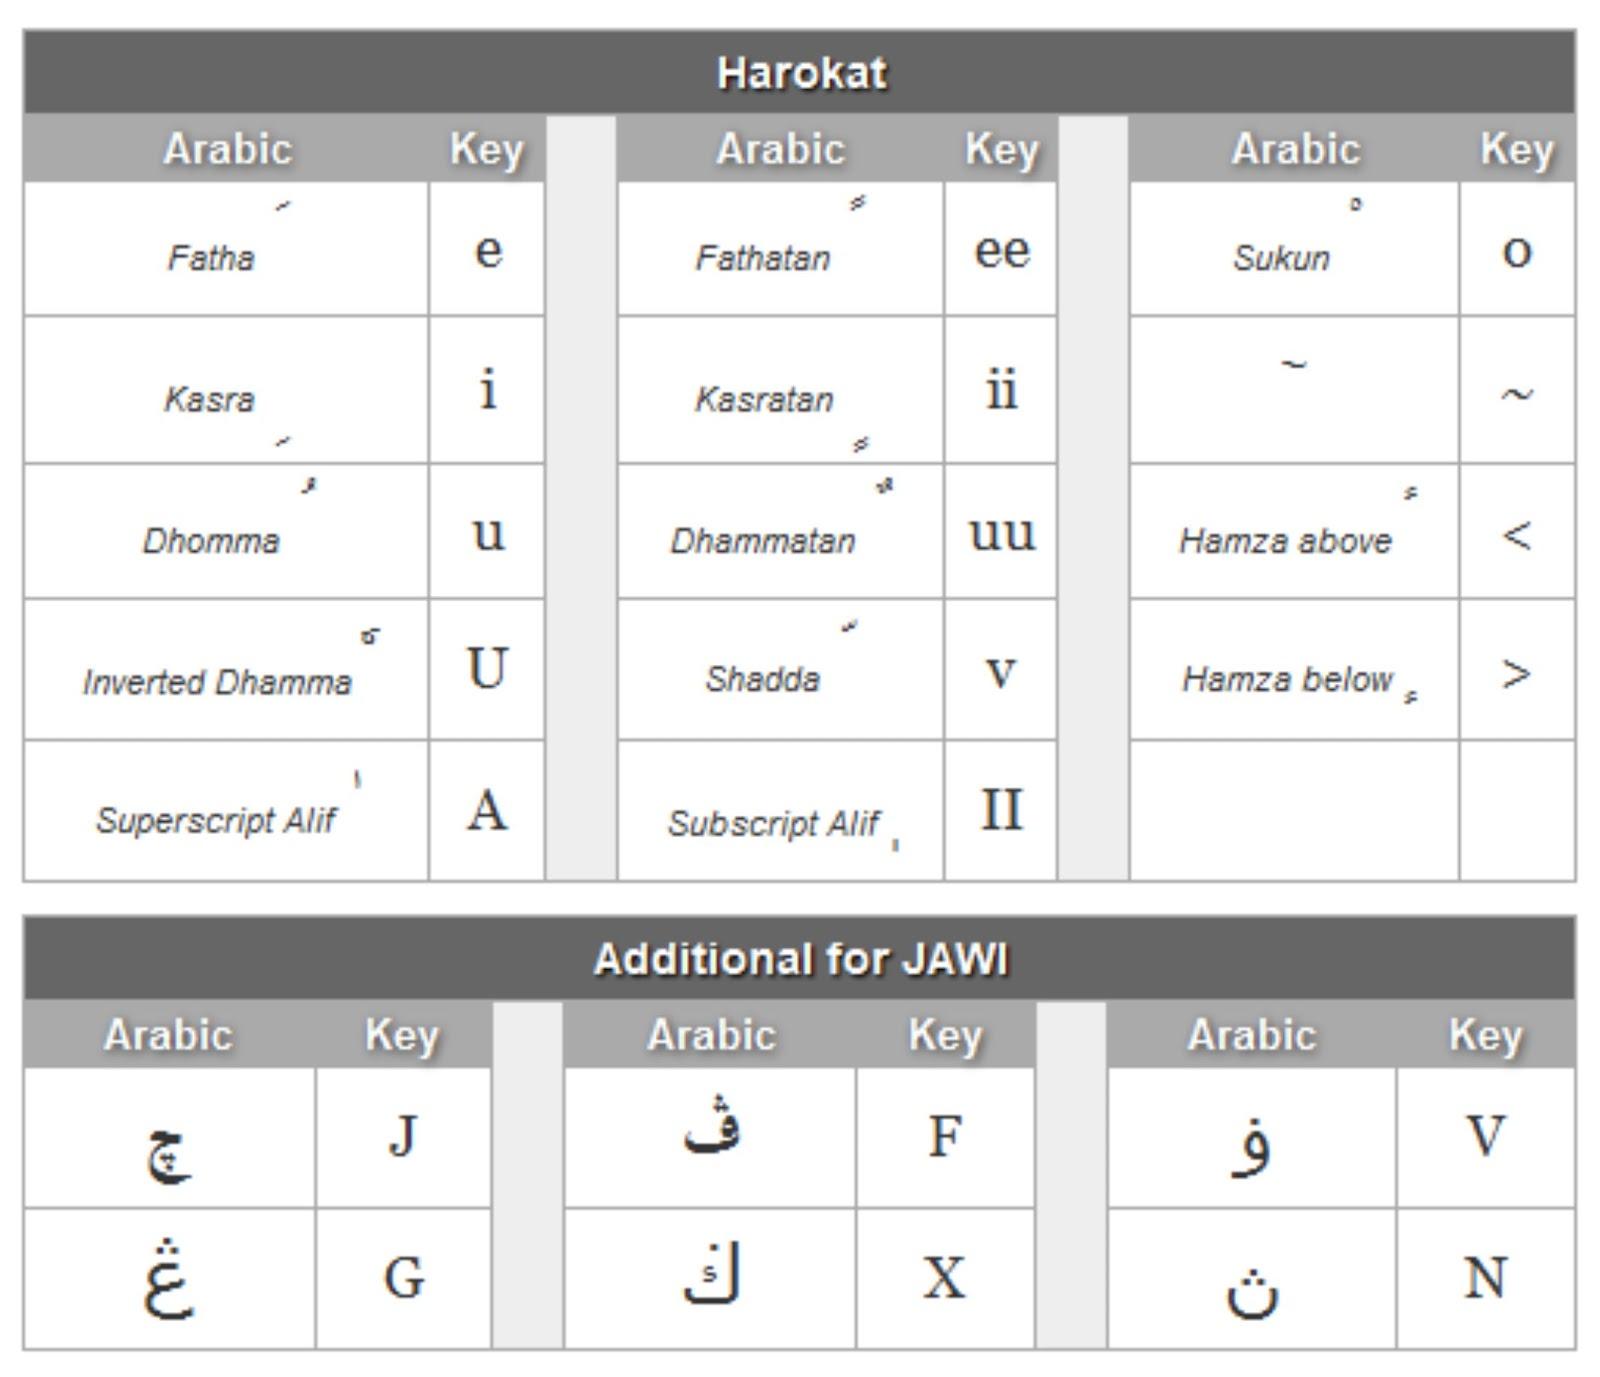 9aba7 2l5air! Texting, Arab style